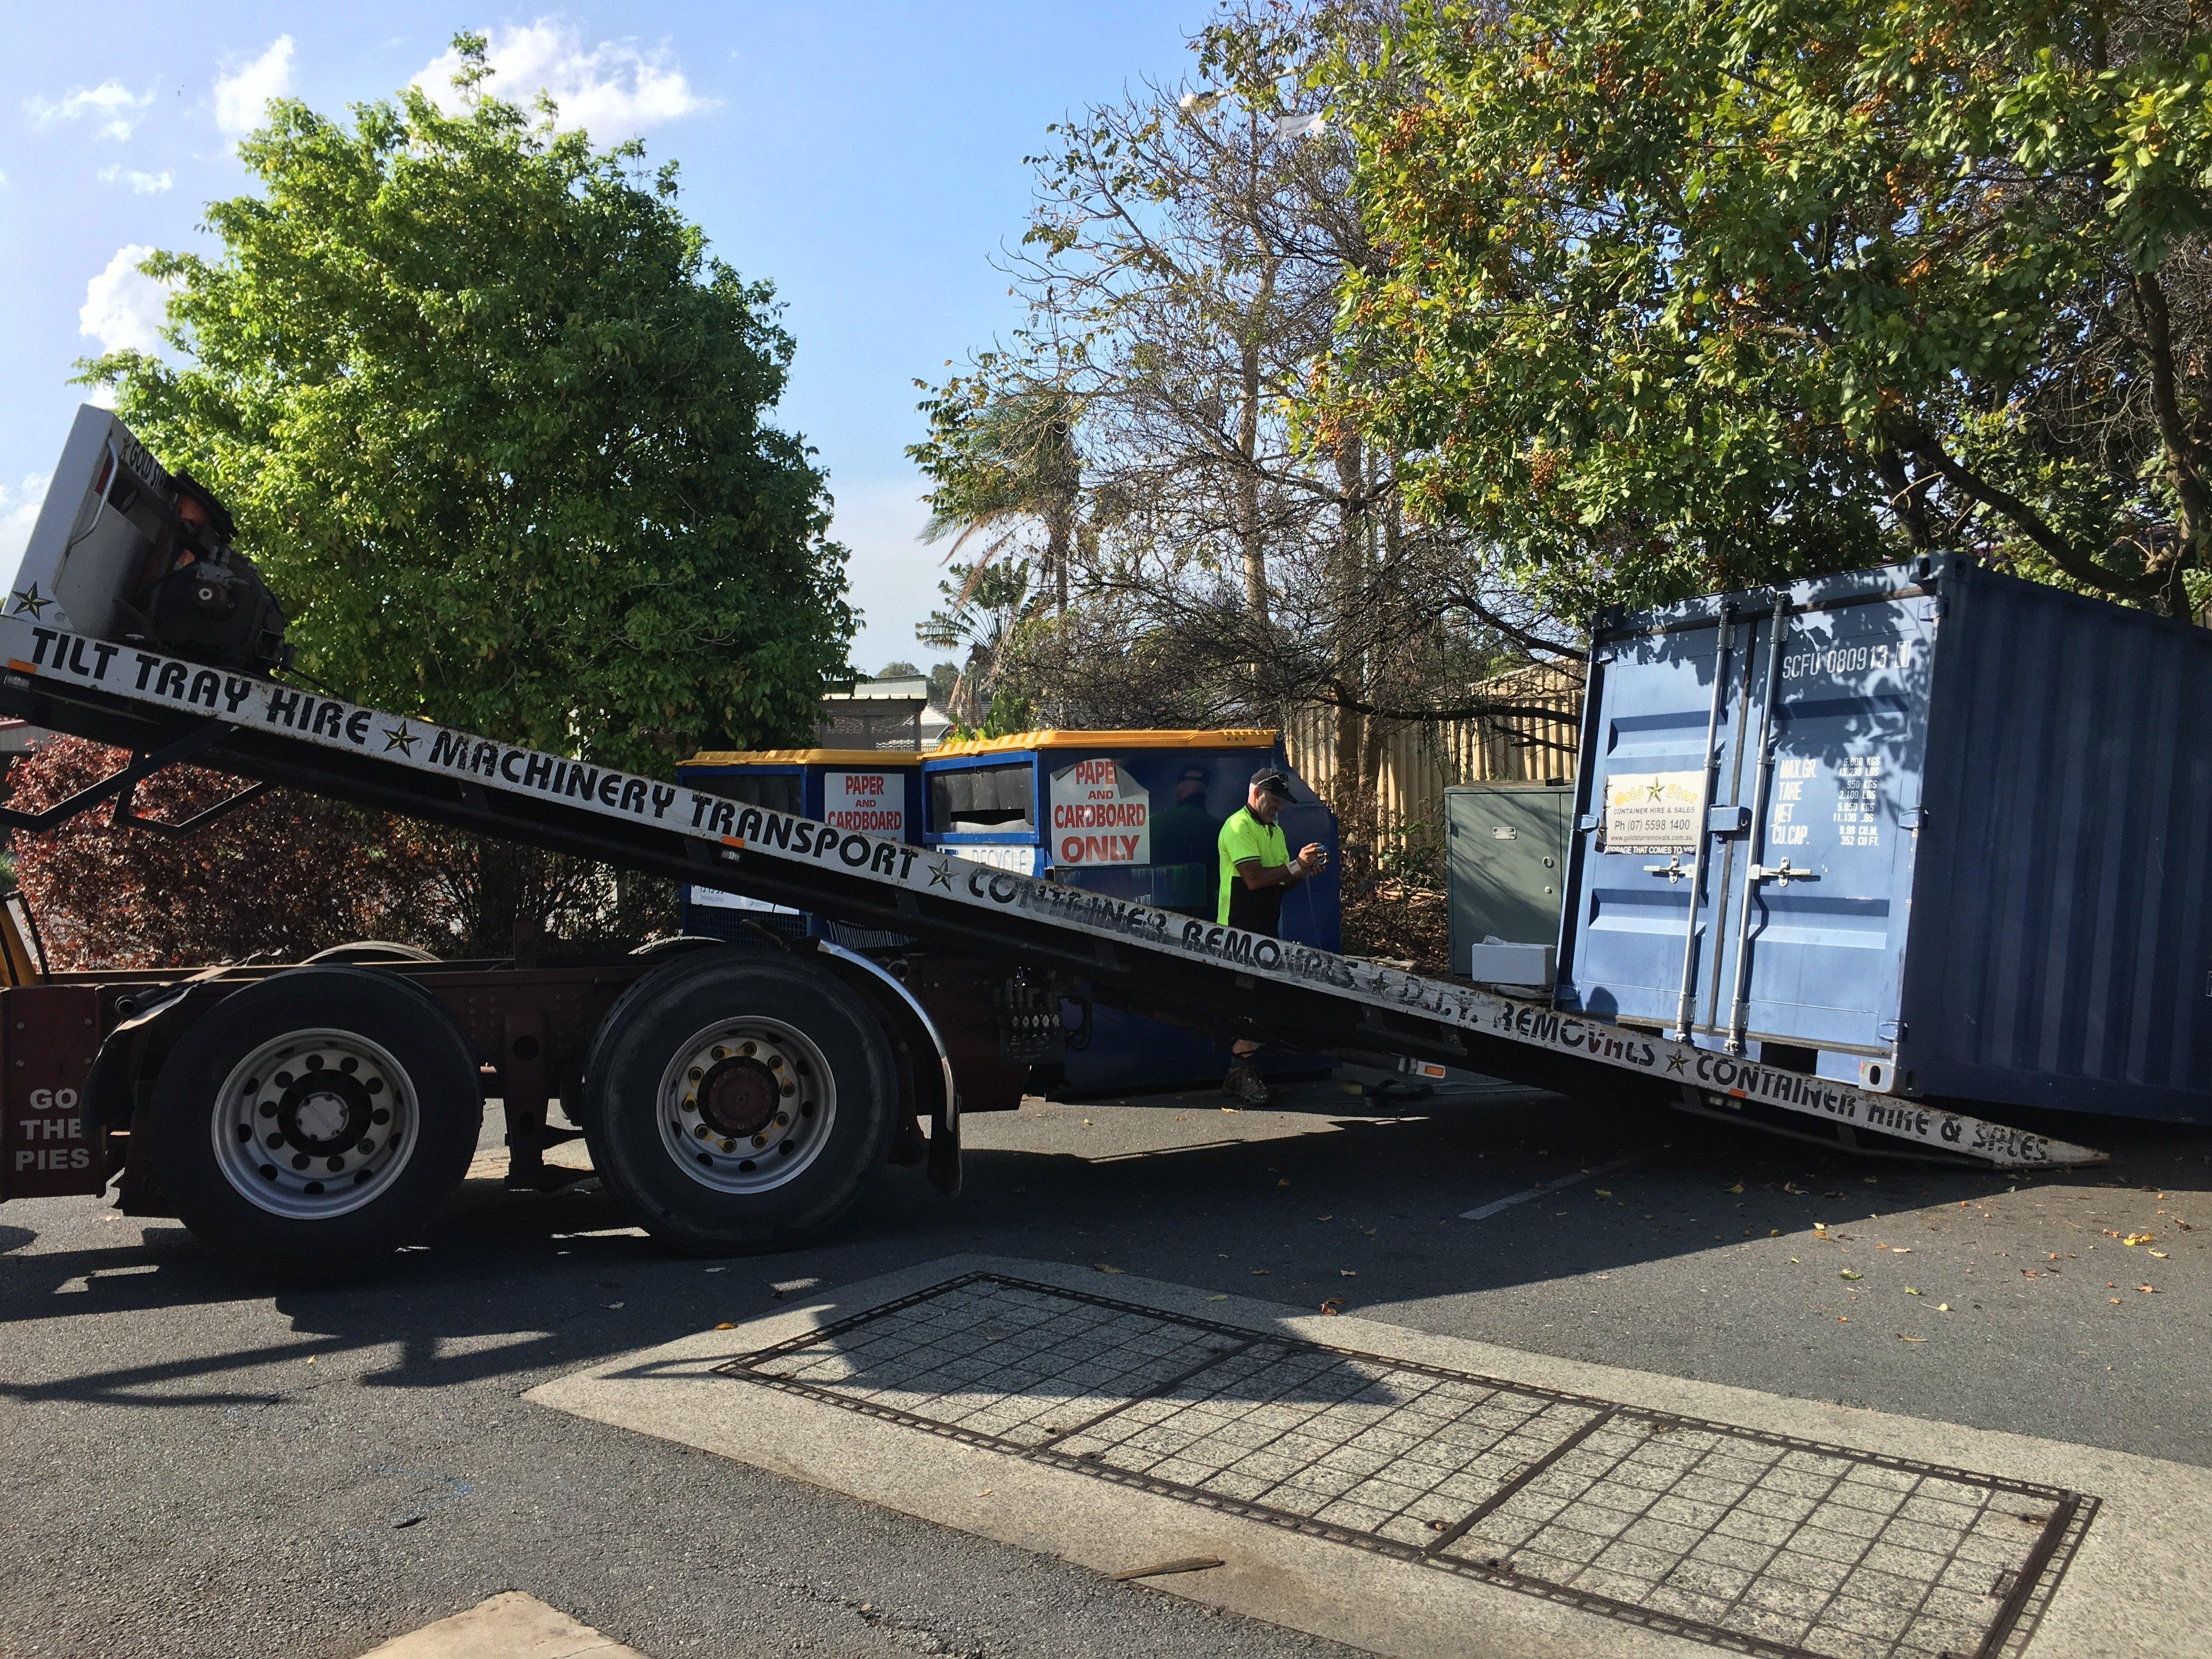 Gold Coast Cheap Tilt Tray Furniture Removalist